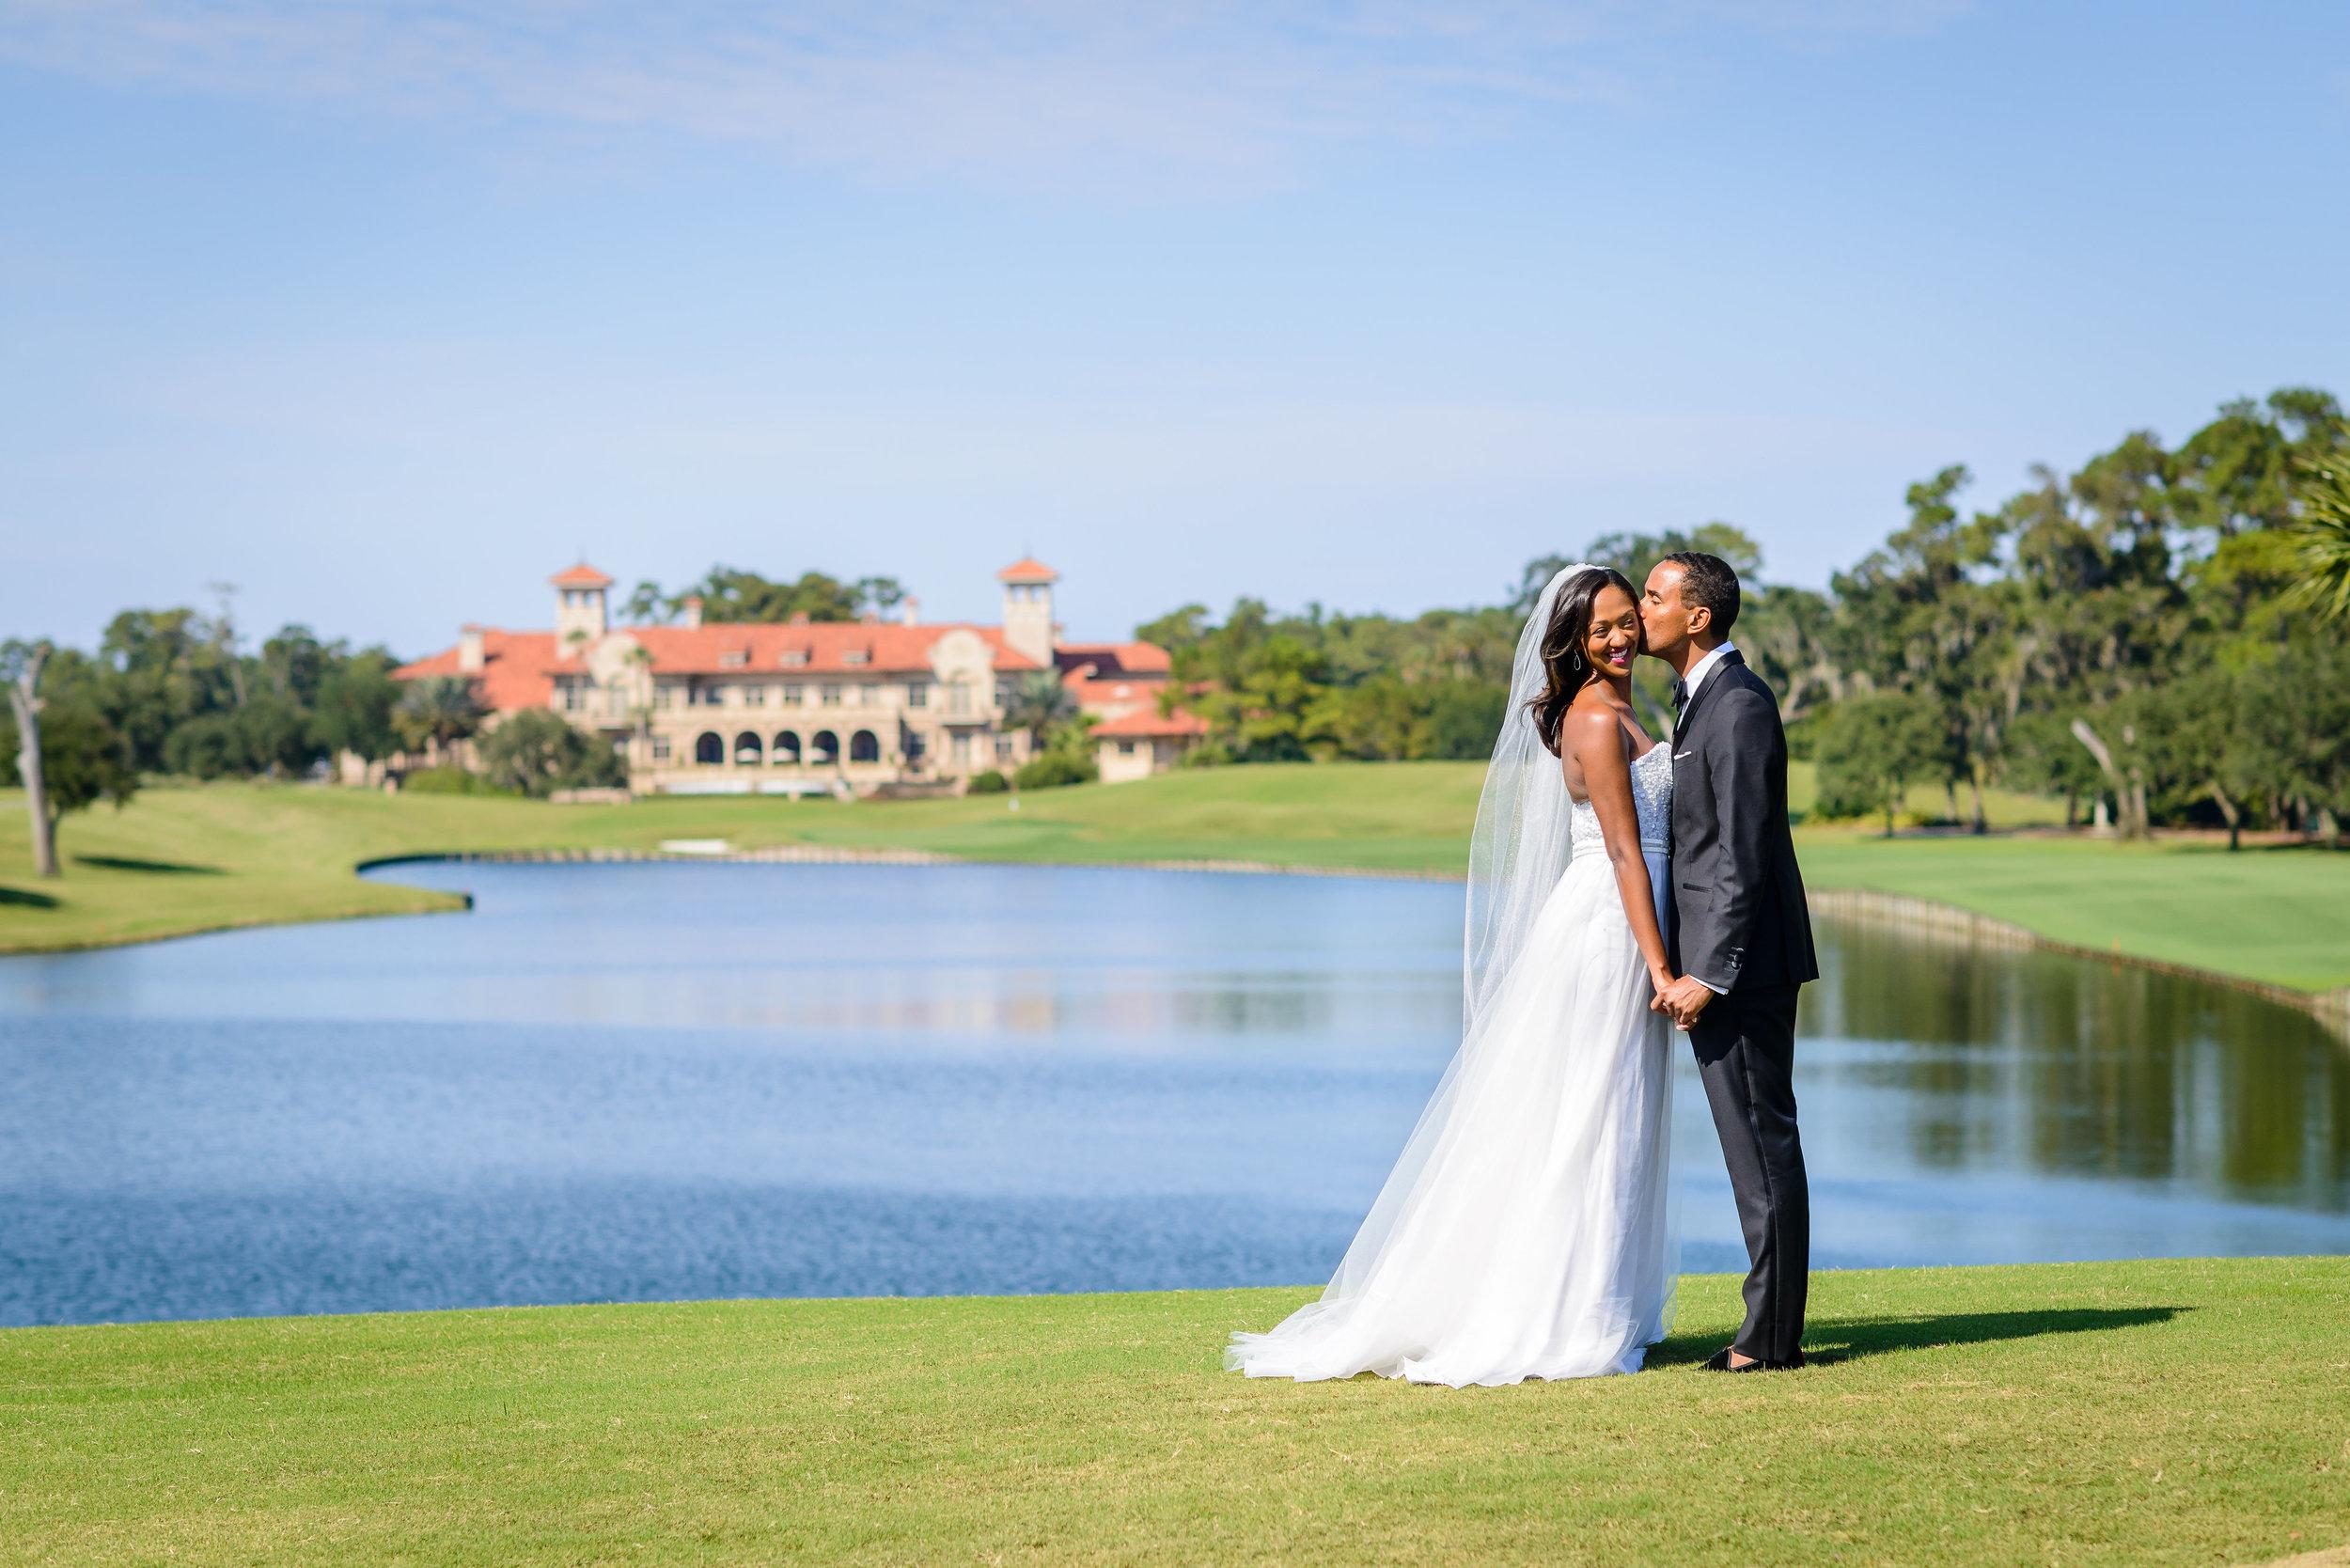 Amanda & Landon Raulerson-The Veil Wedding photography,http://www.theveilweddingphotography.com